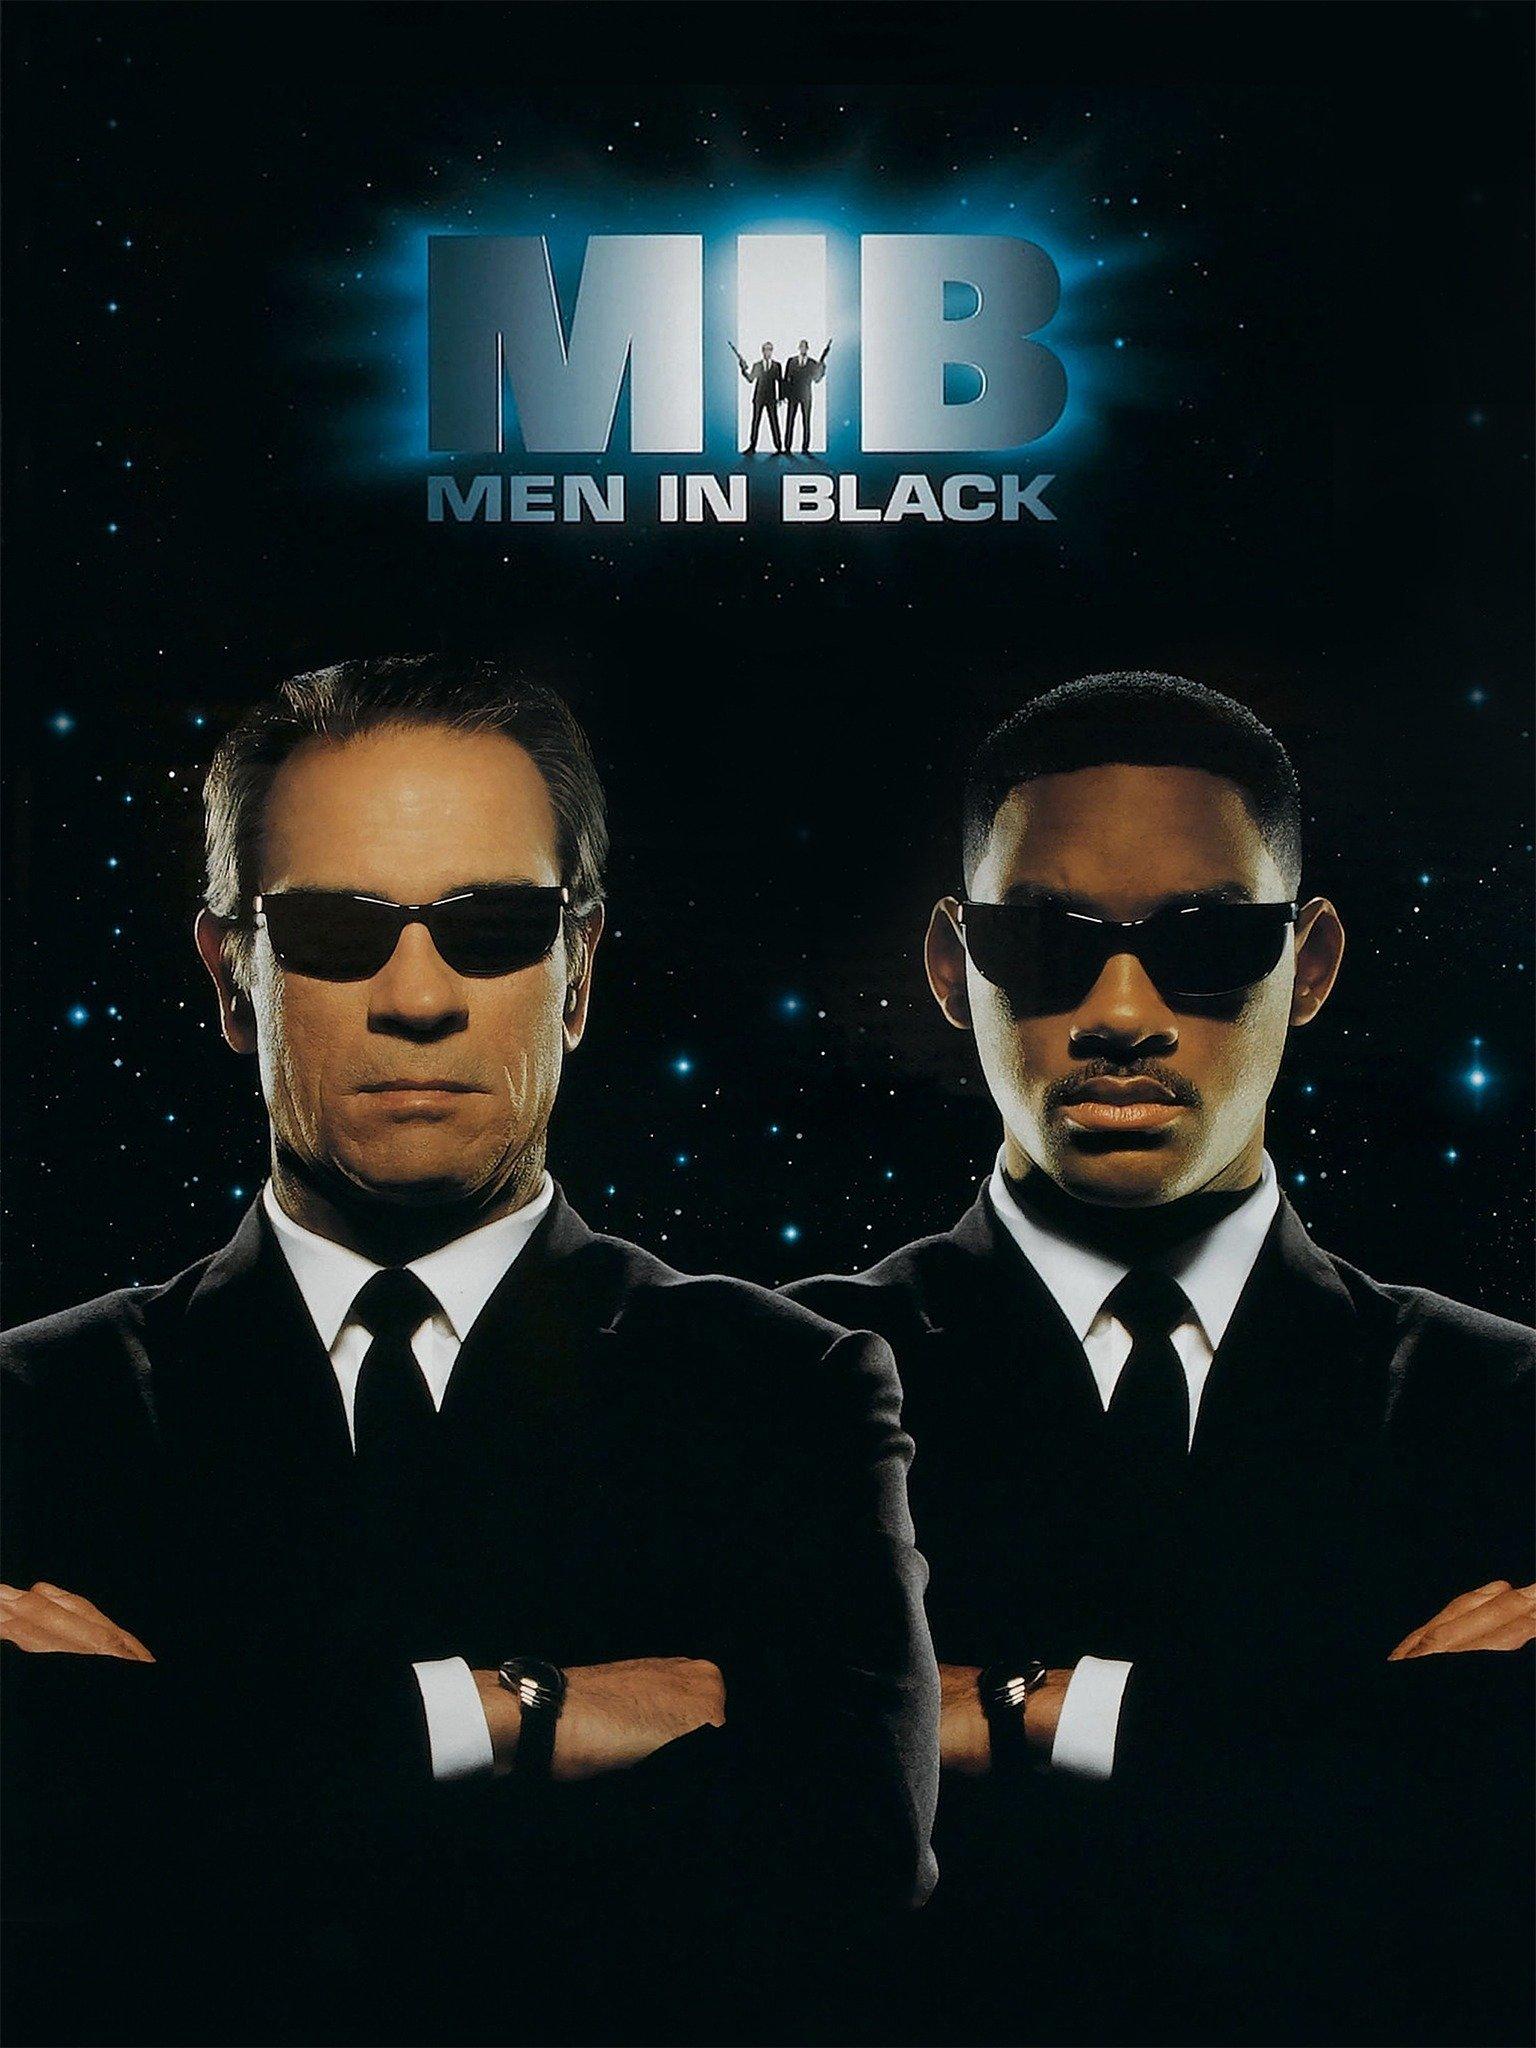 Men in Black (1997) - Rotten Tomatoes